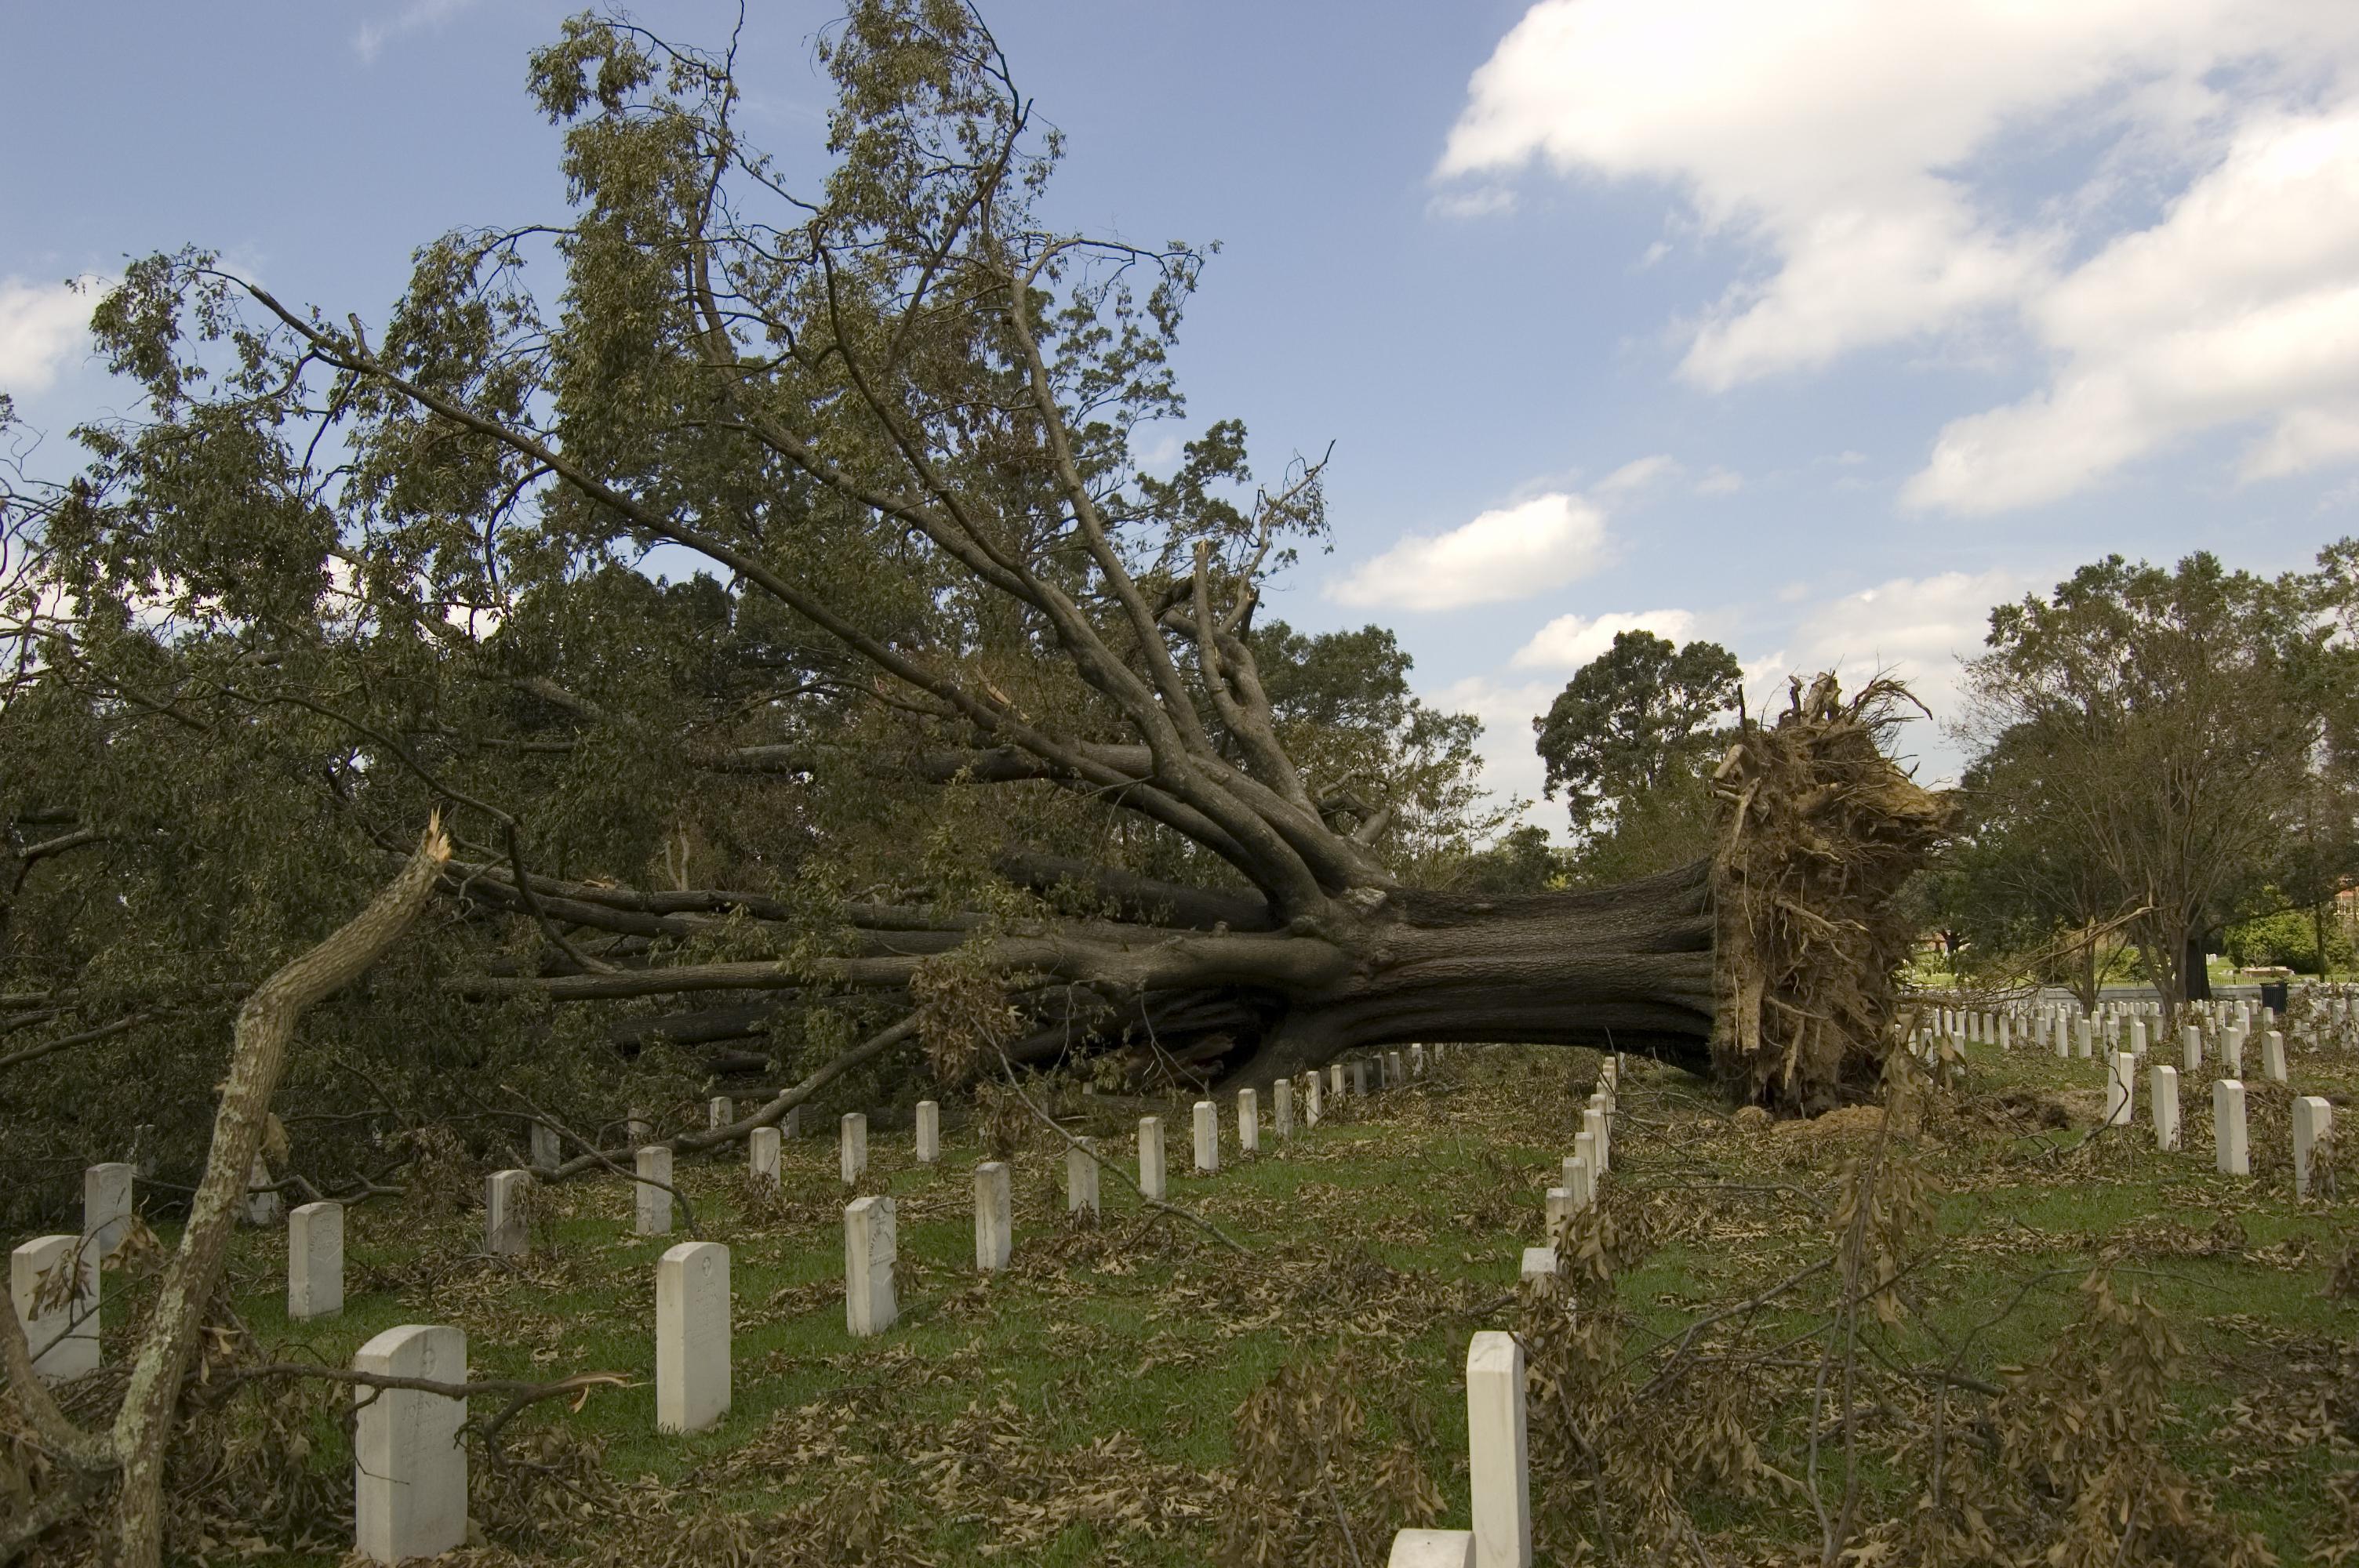 File:FEMA - 39142 - Tree blown over in a cemetery in Louisiana.jpg ...